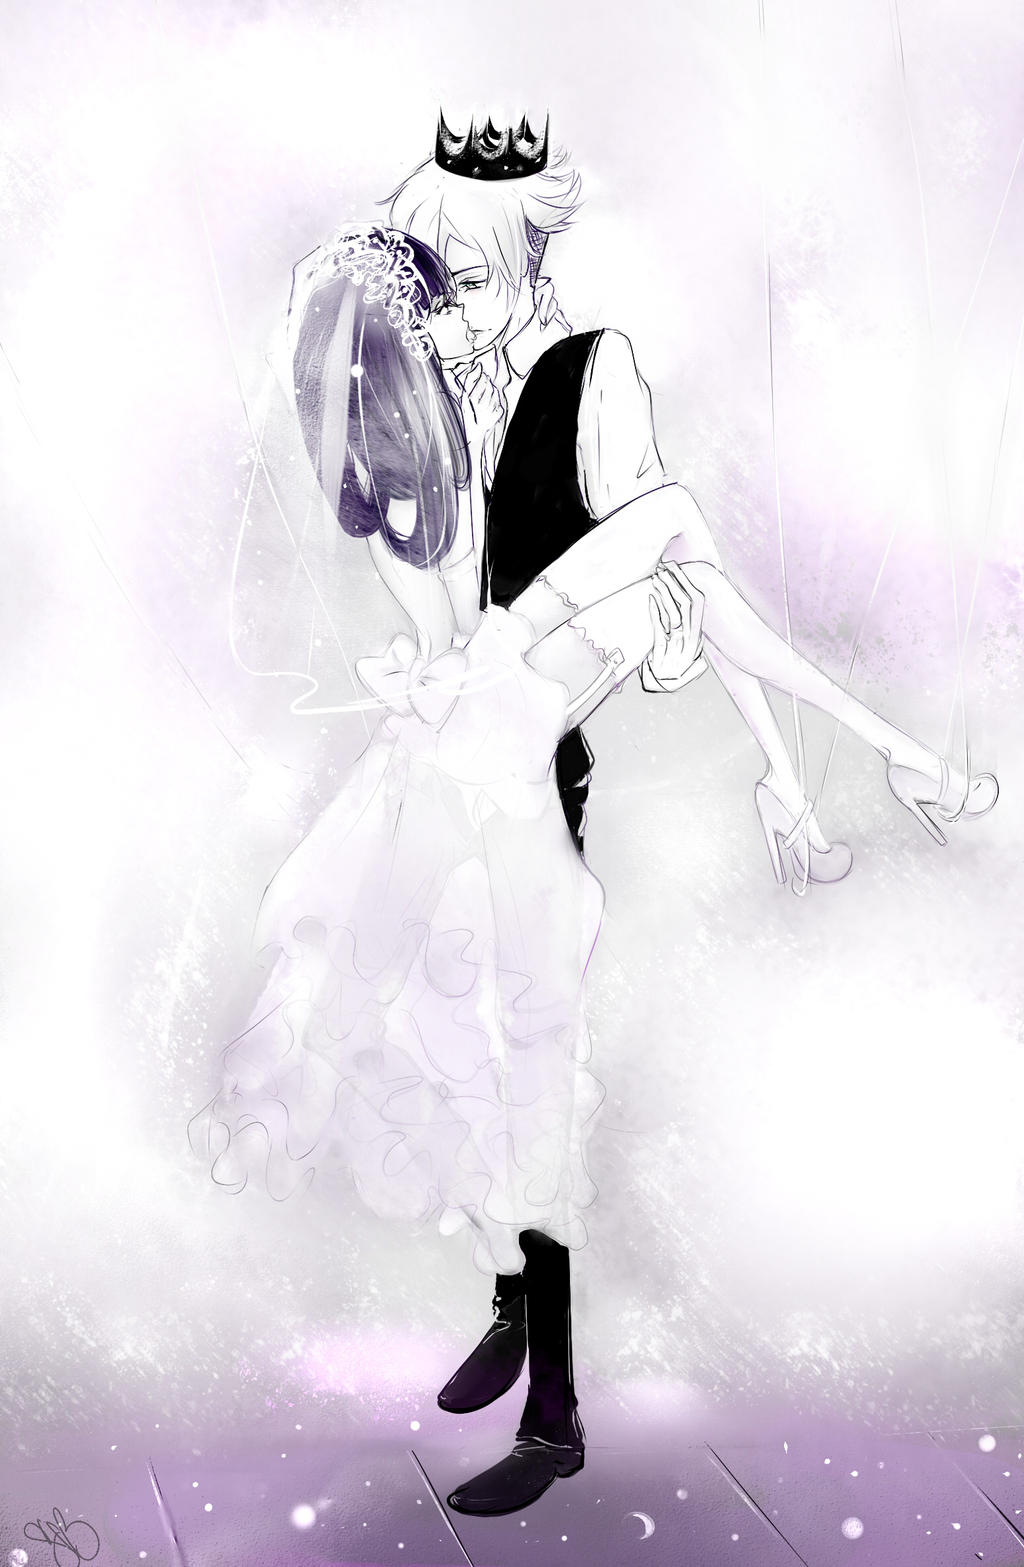 Queen Decim and his King Chiyuki by SnowAnaya on DeviantArt